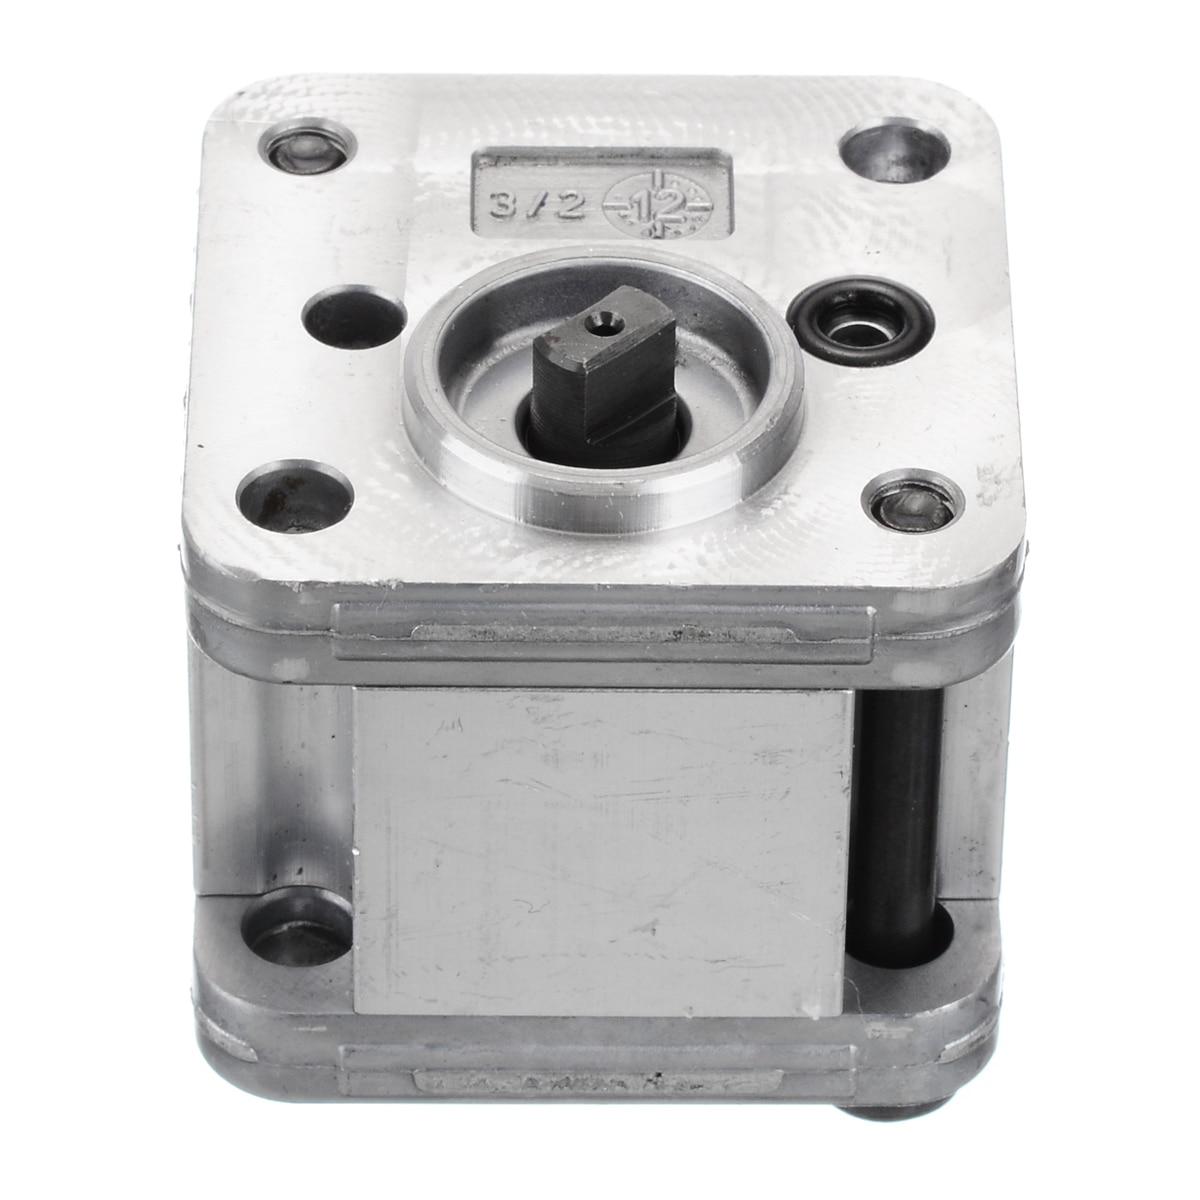 1Pcs Hydraulic Gear Pump Metal Mini Gear Pump Hydraulic Model Excavating Machinery For Home Tools High Quality